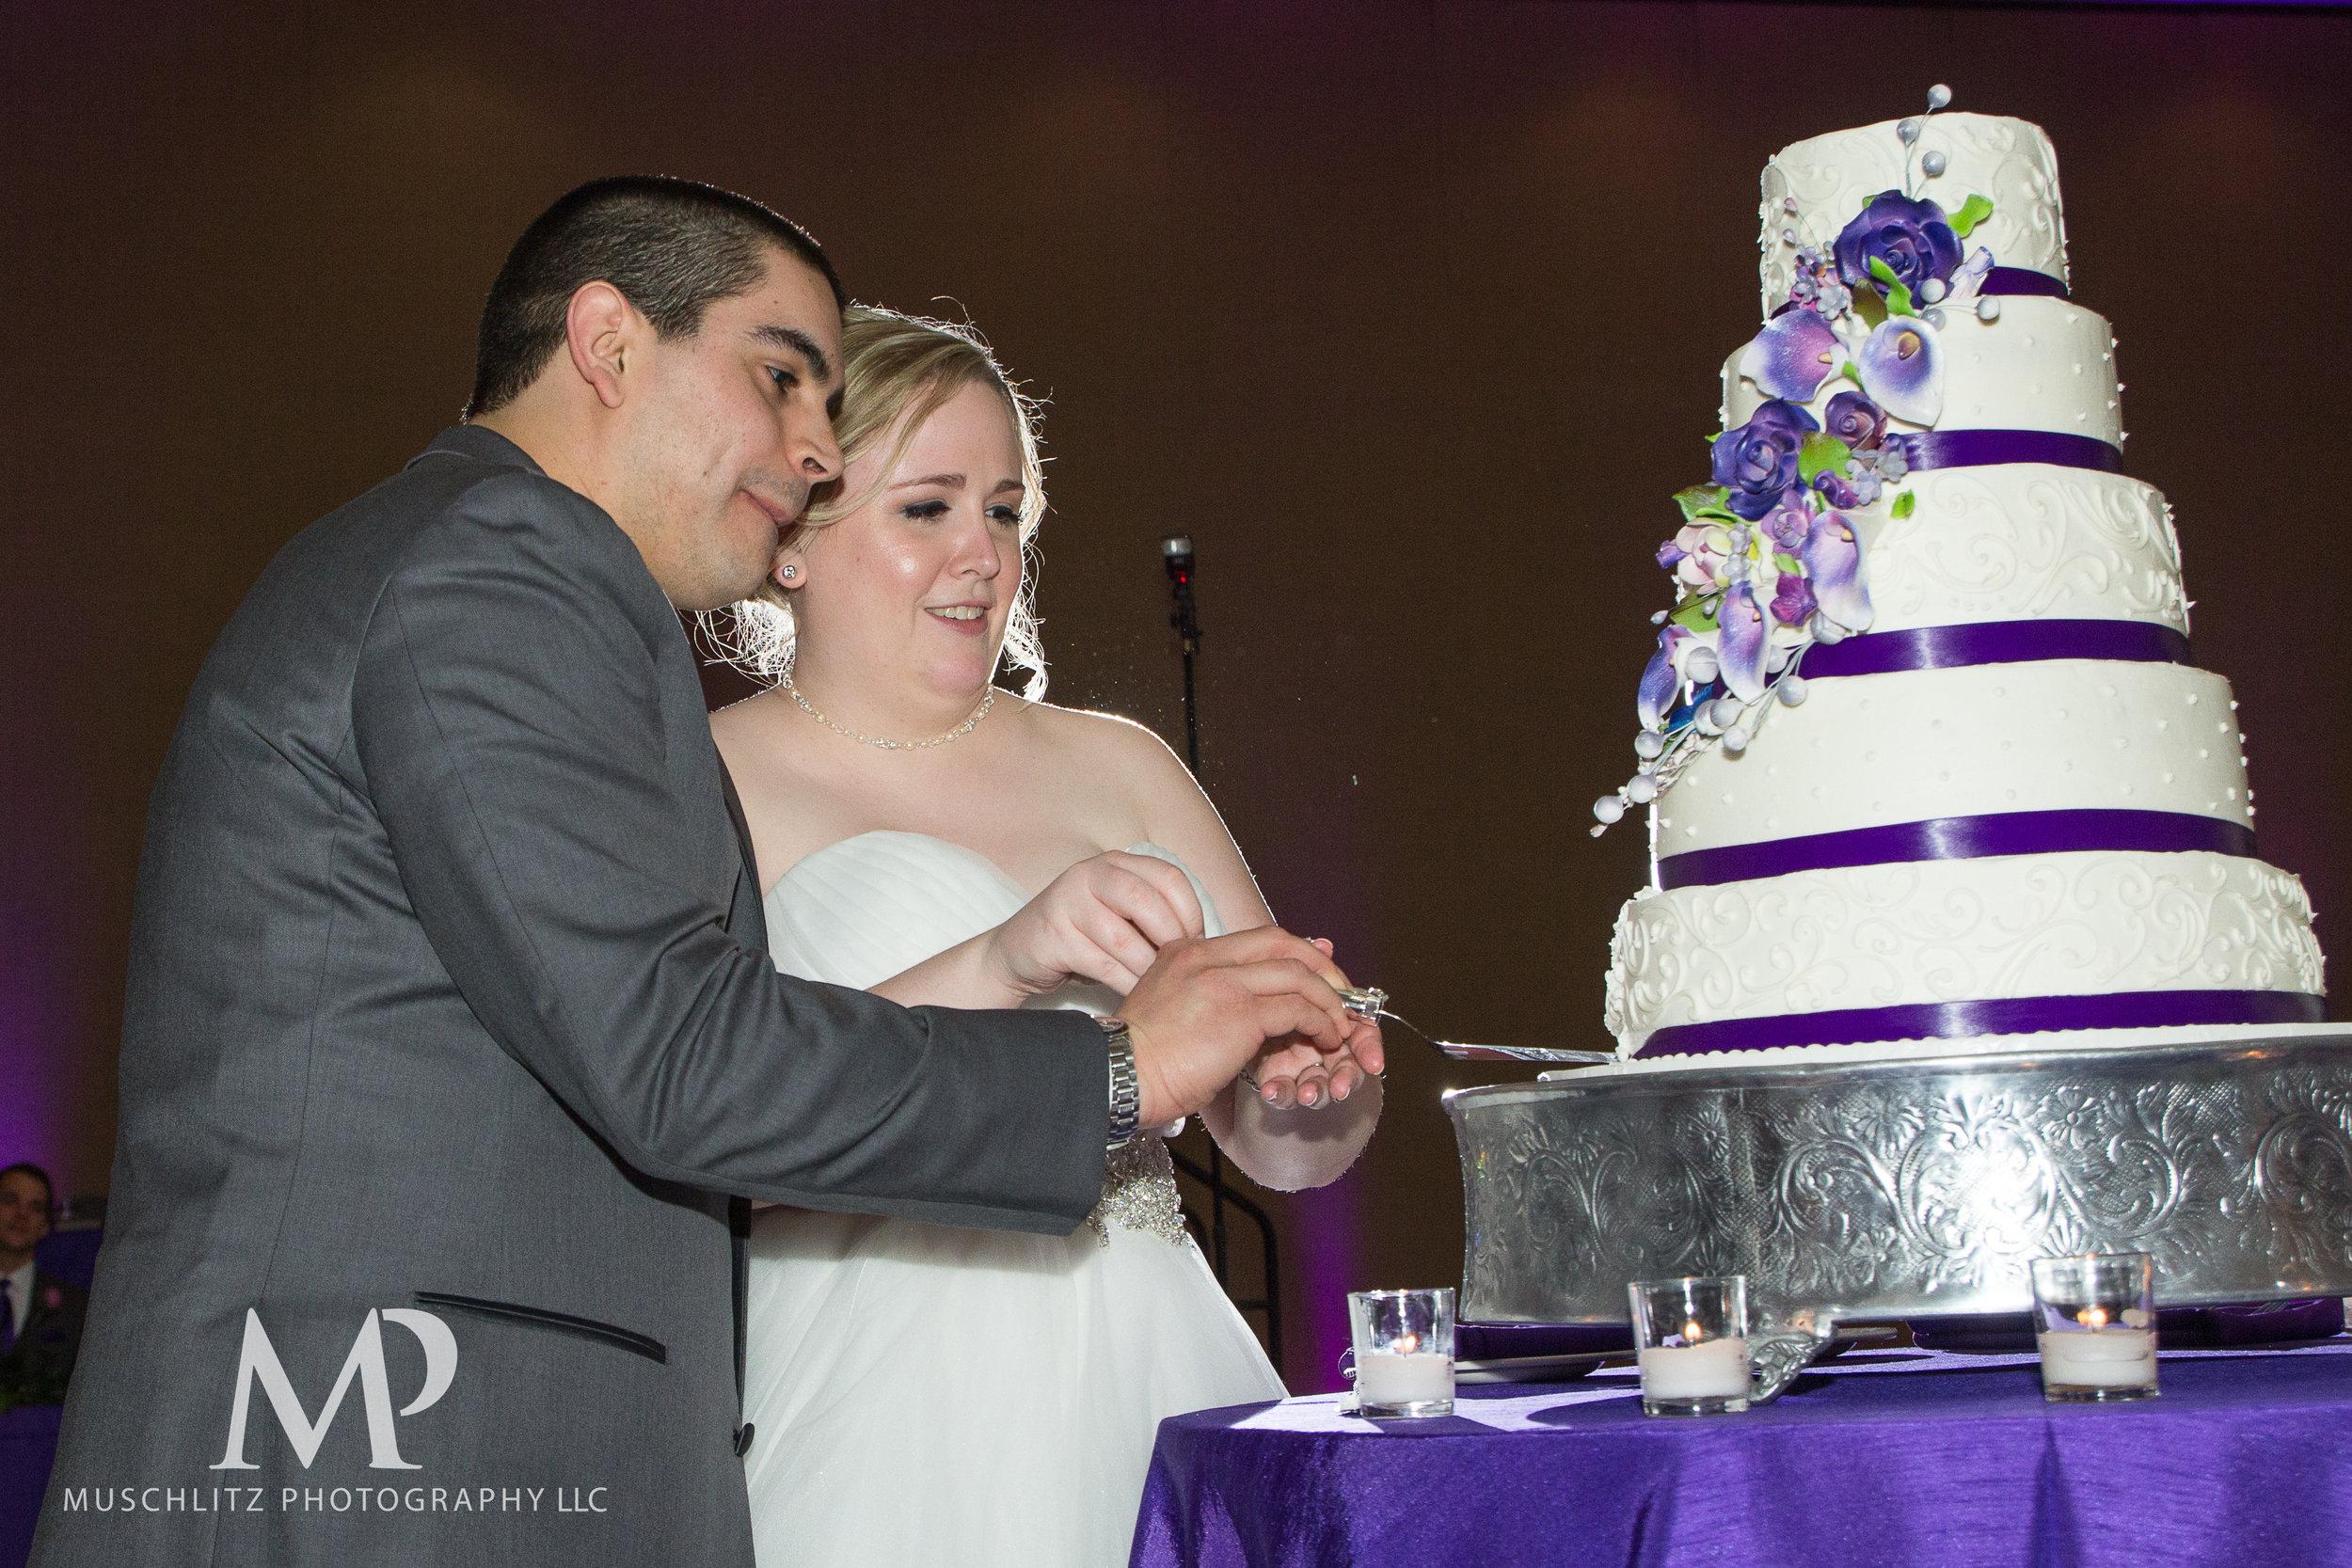 hilton-polaris-wedding-columbus-ohio-muschlitz-photography-036.JPG